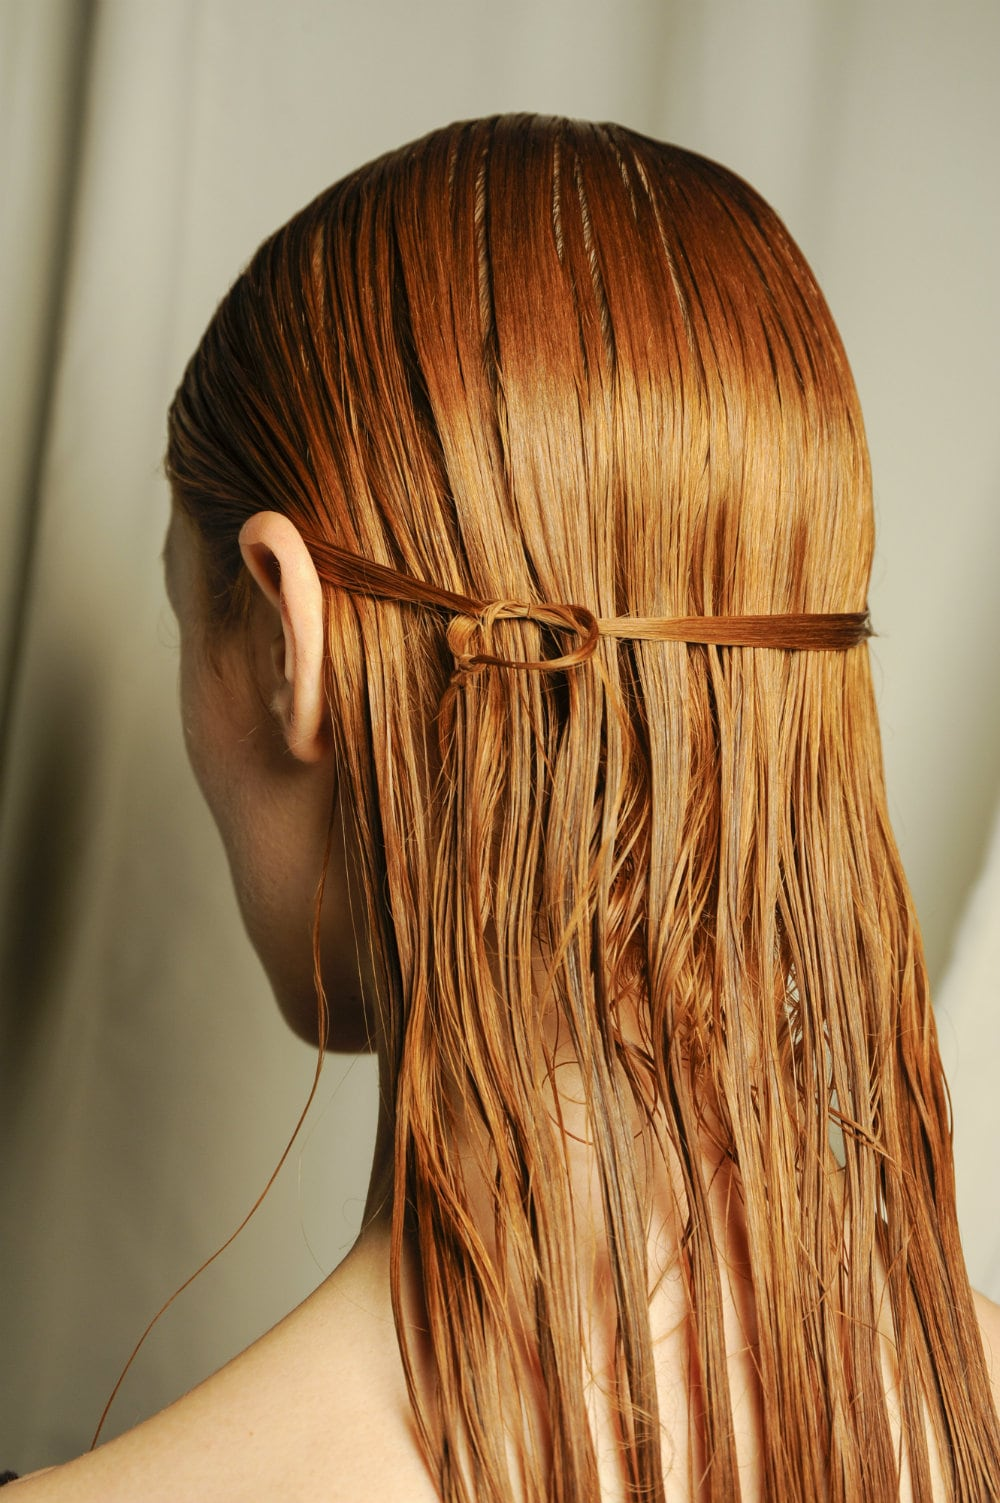 pelo largo rojizo naranja wet sucio mechón atado nudo